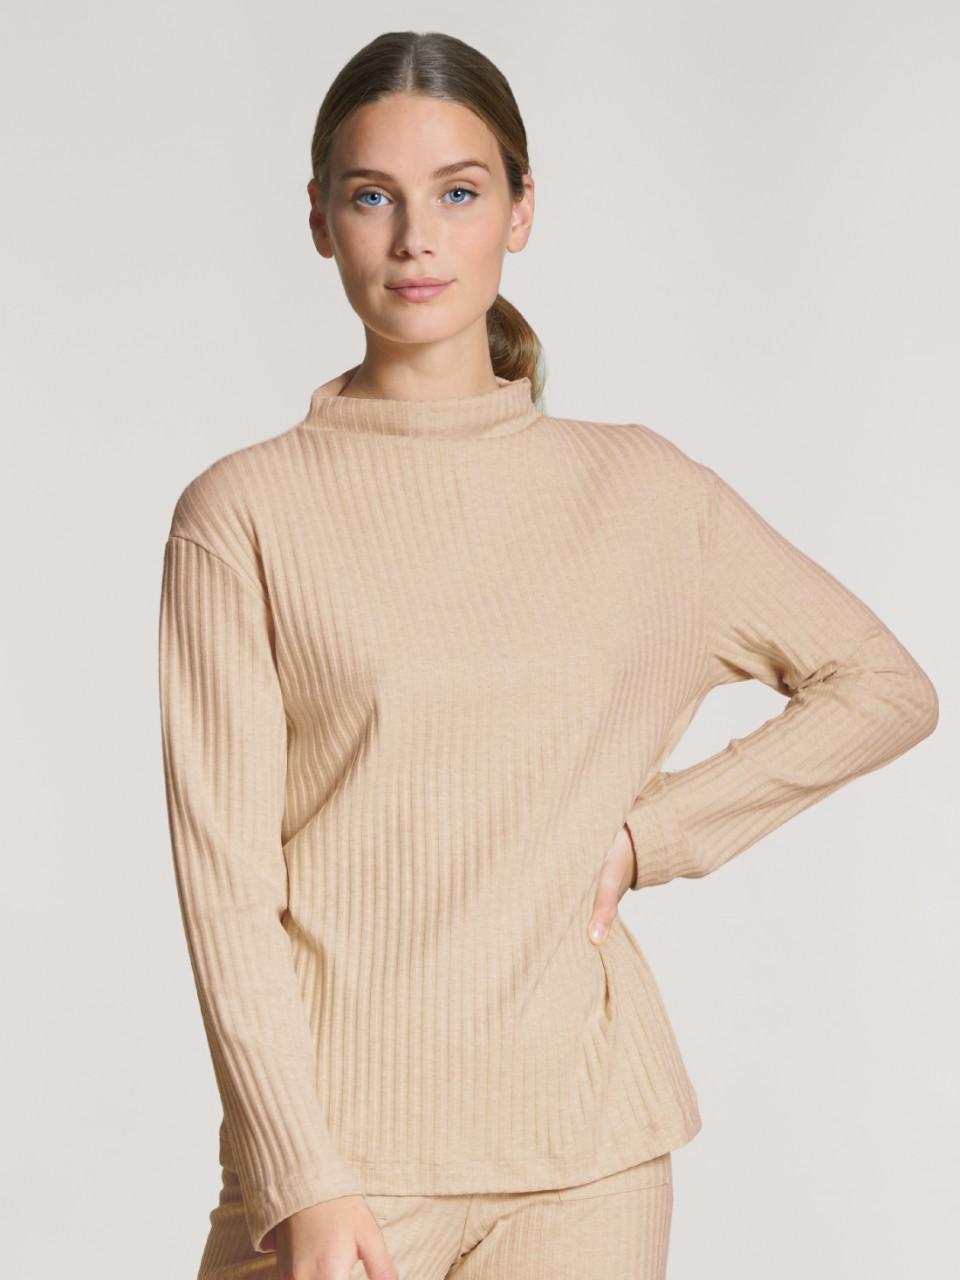 Calida Sweater The Home Hub 15054 / 926